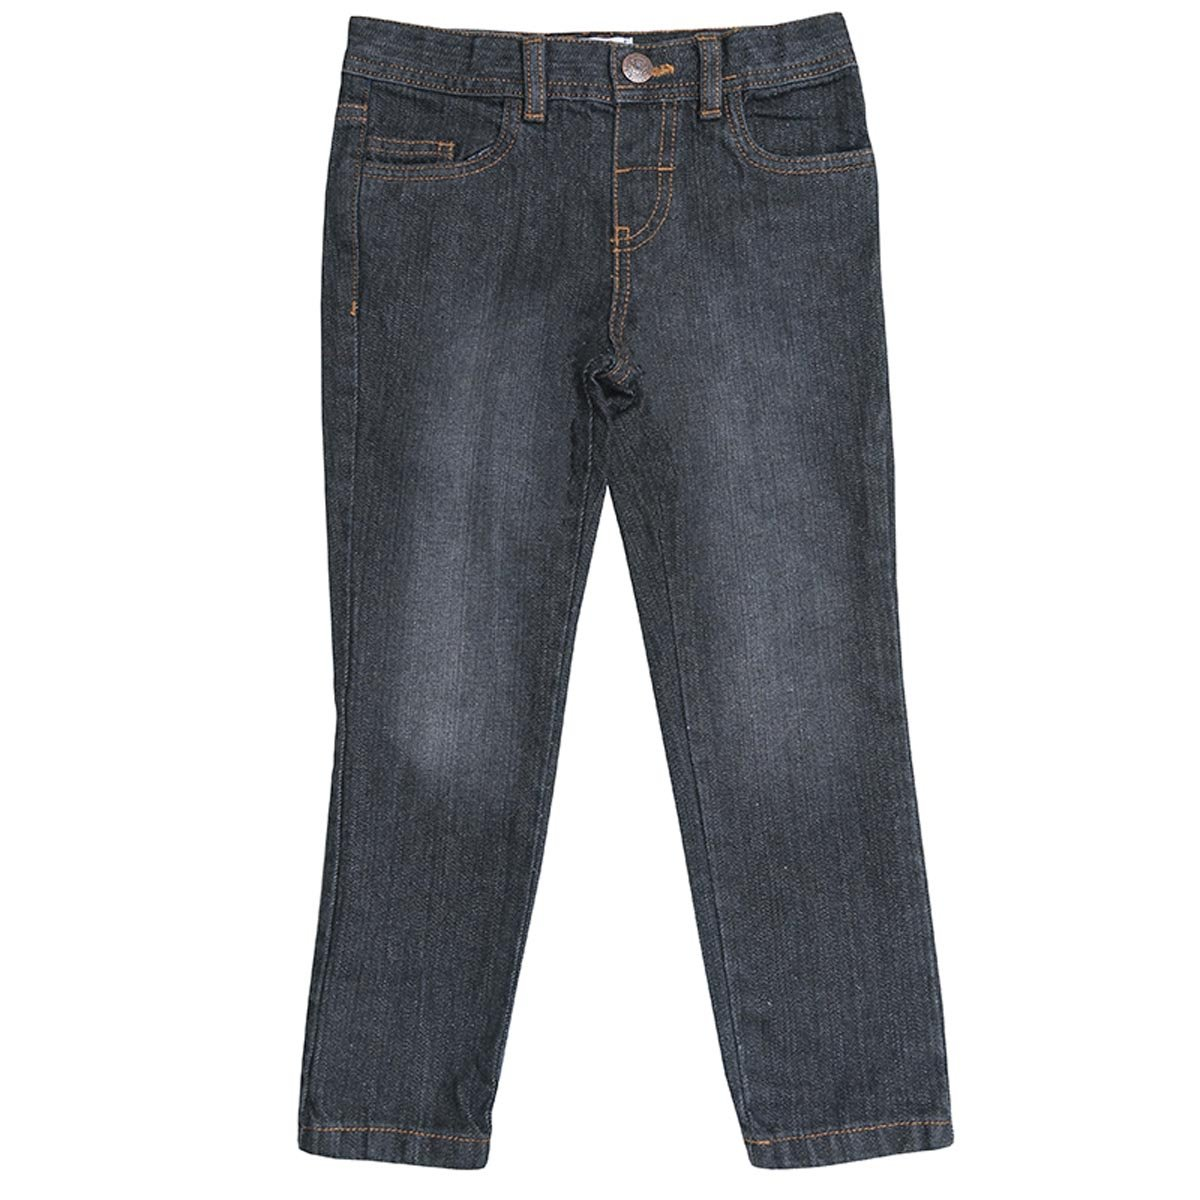 Boys Black Grey Washed Denim Slim Leg Fashion Jeans Sizes from 2 to 6 Years